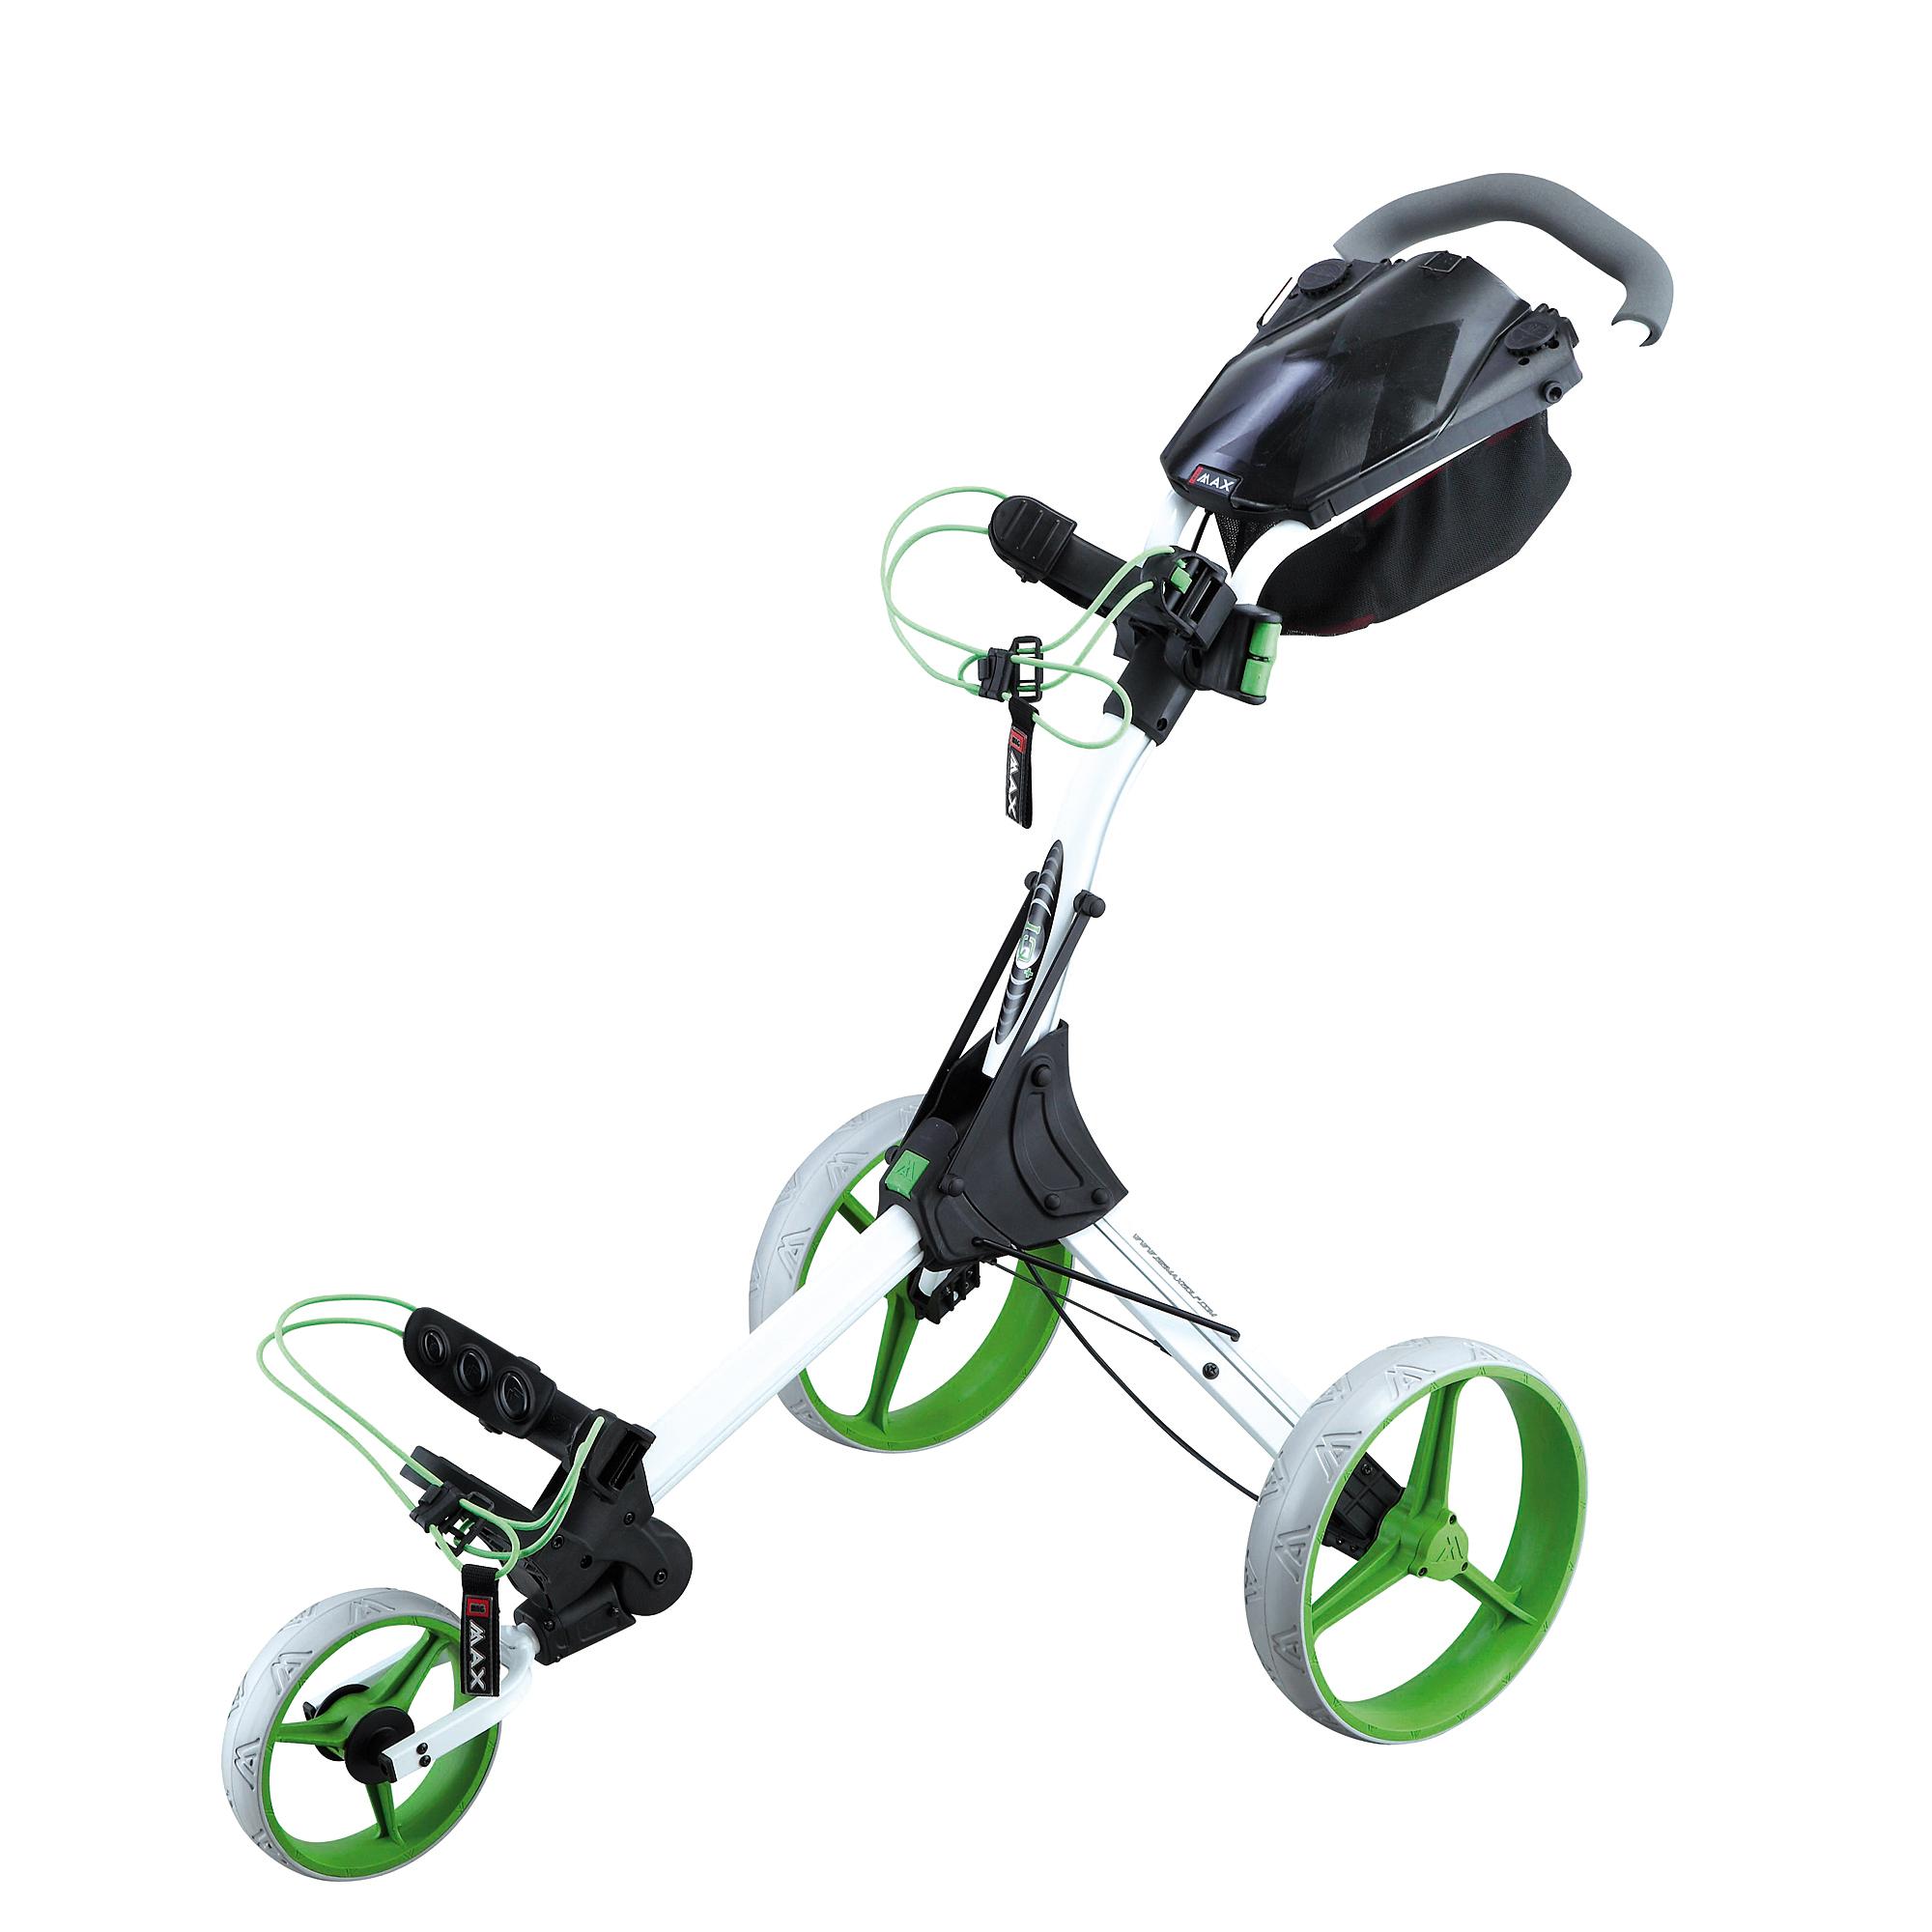 Big Max IQ Plus Golf Trolley – White/Lime